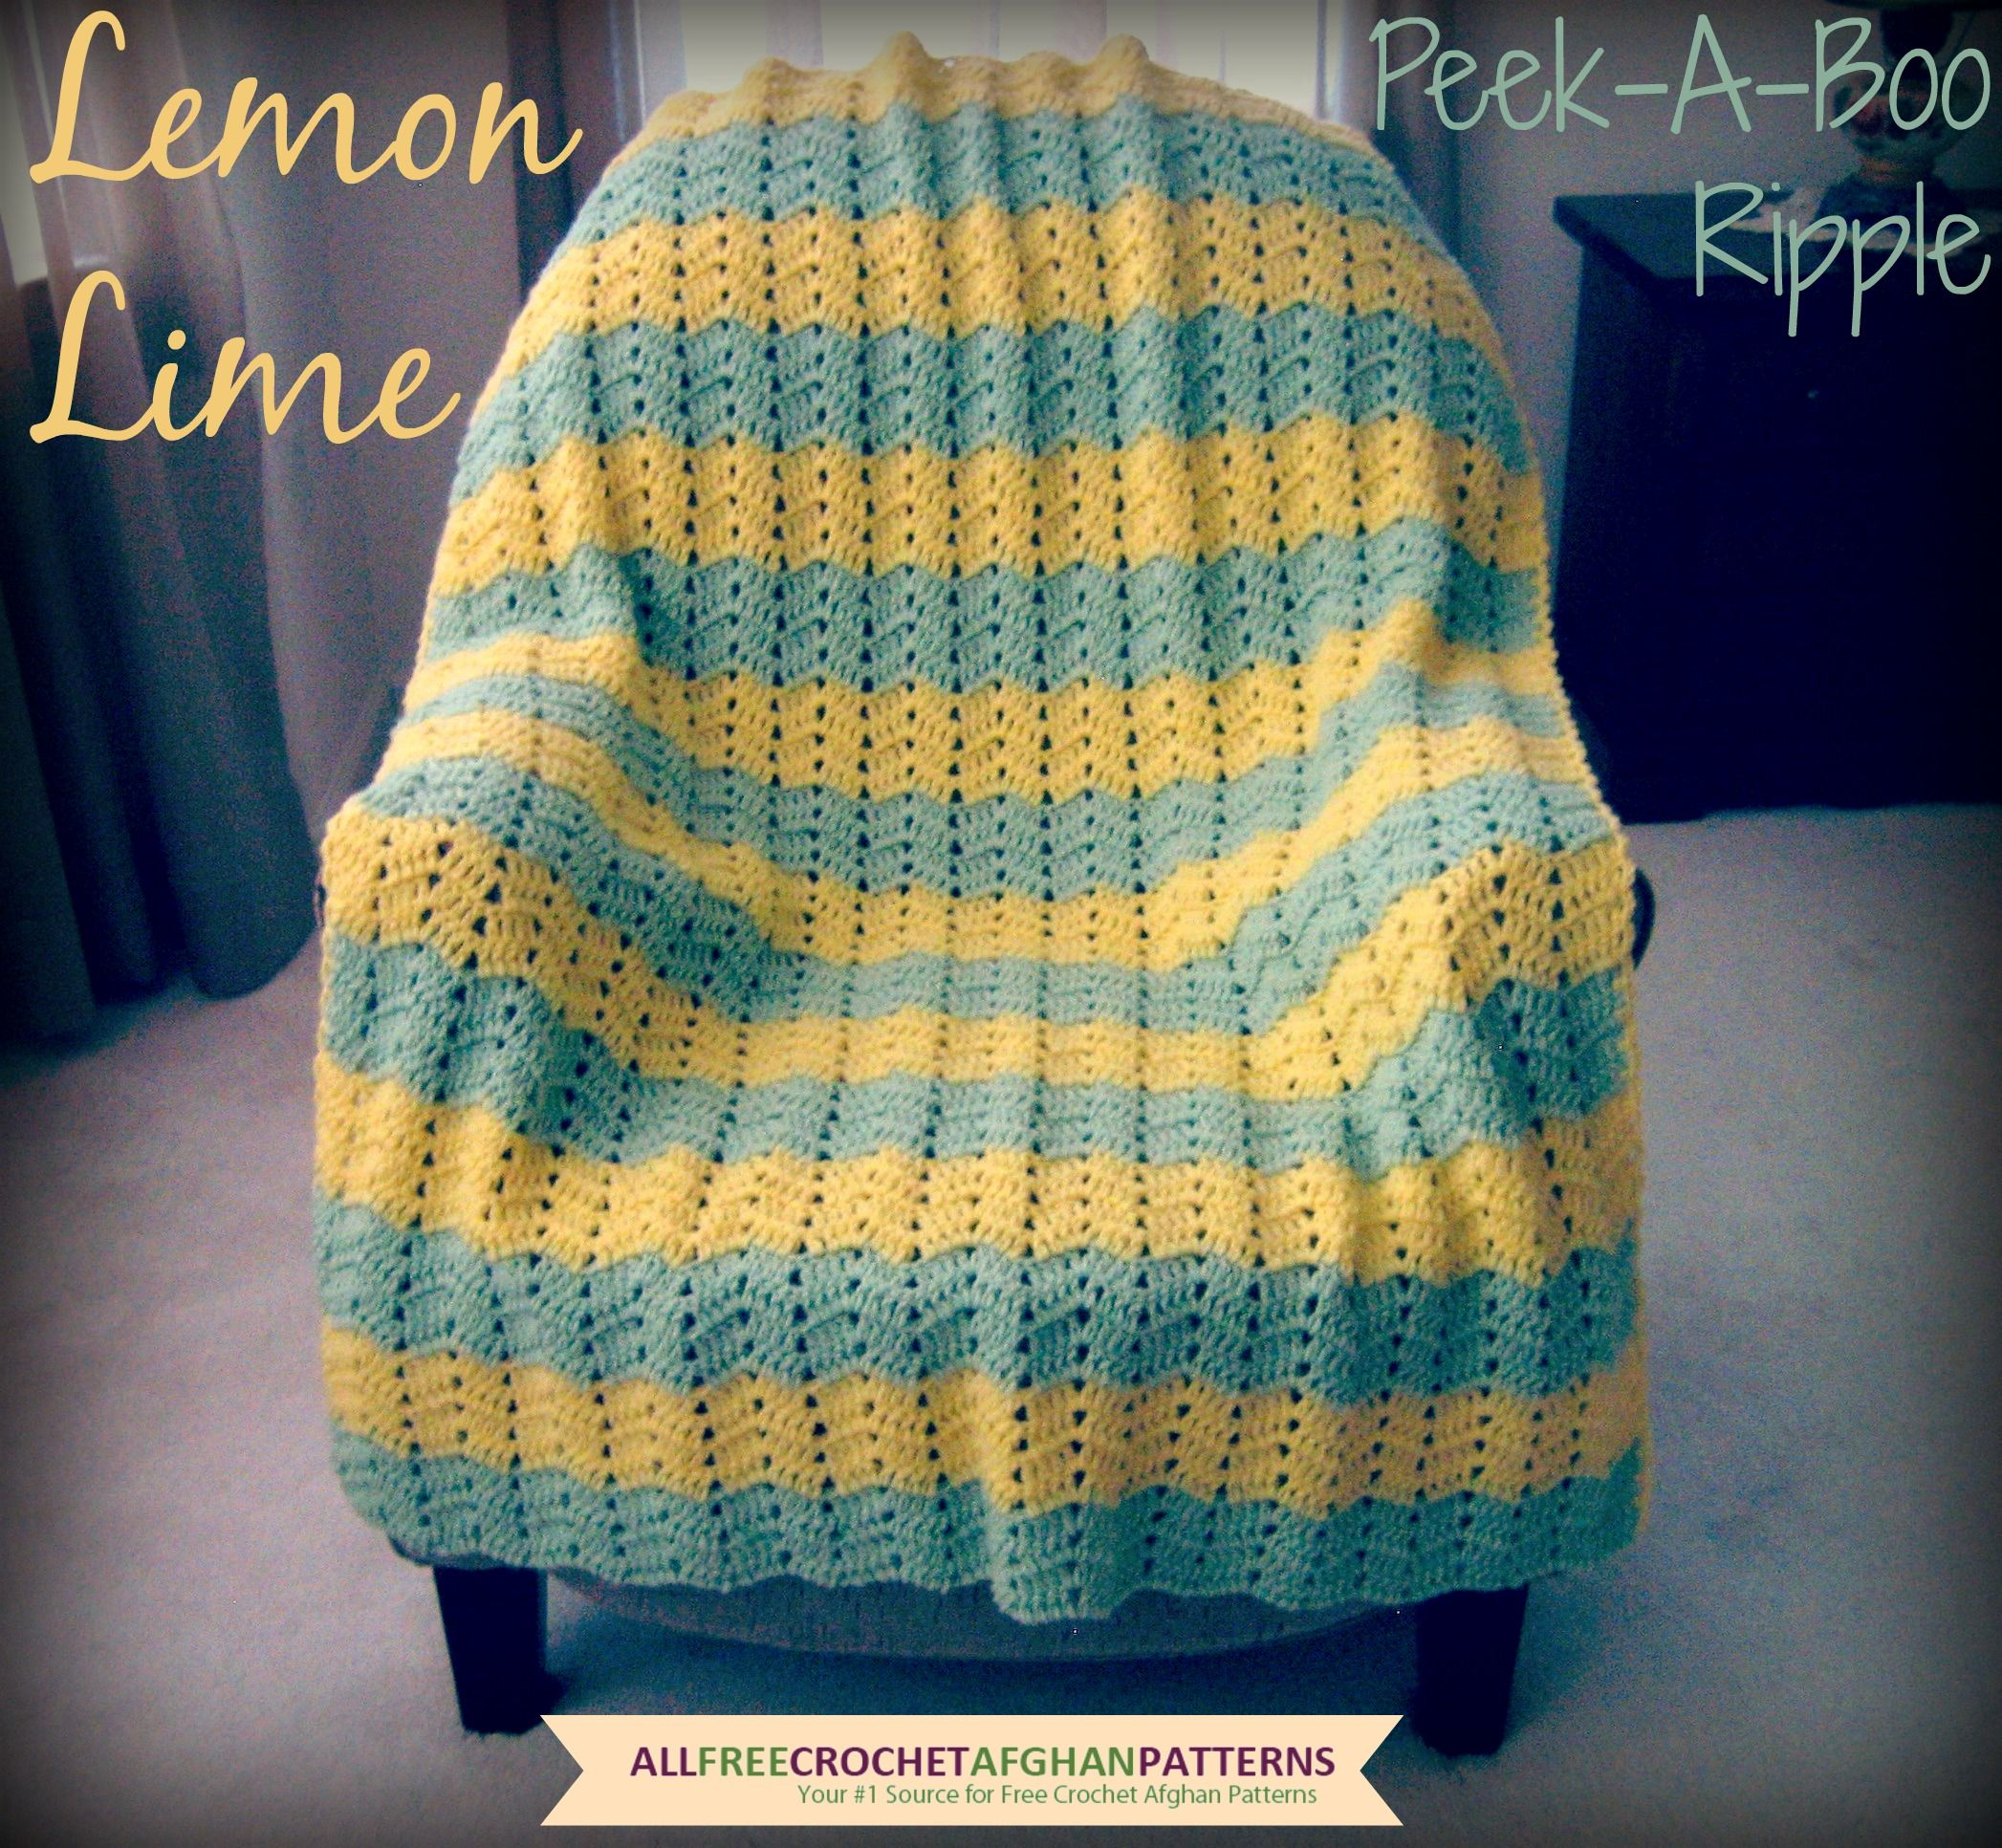 Lemon Lime Peek-A-Boo Ripple | Ripple afghan, Lemon lime and Afghans